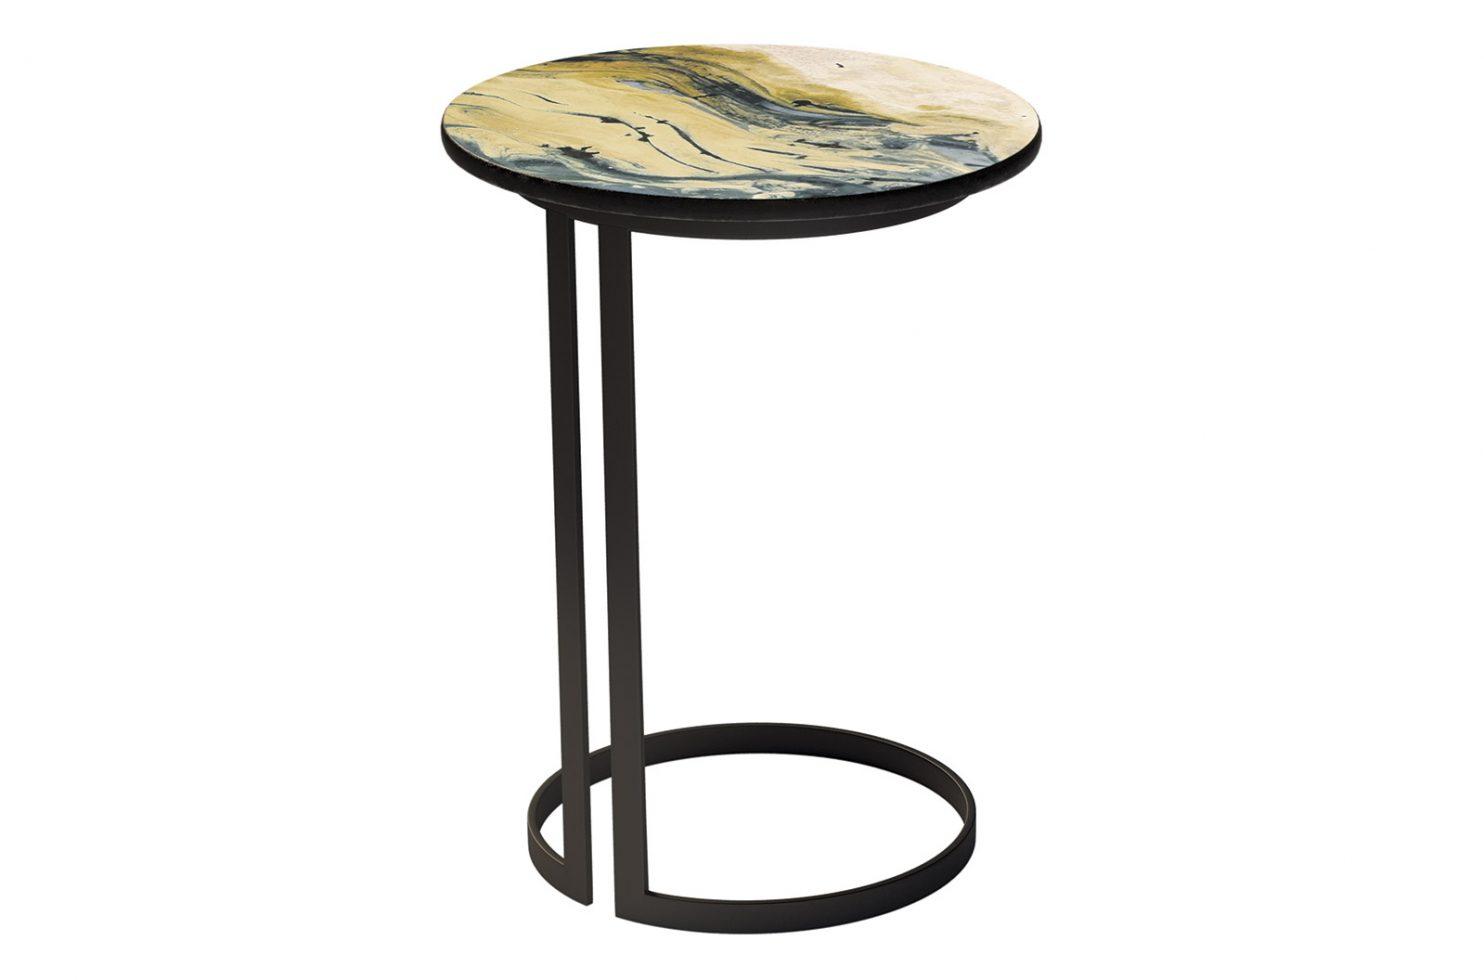 etna c table 390FT002P2SG back